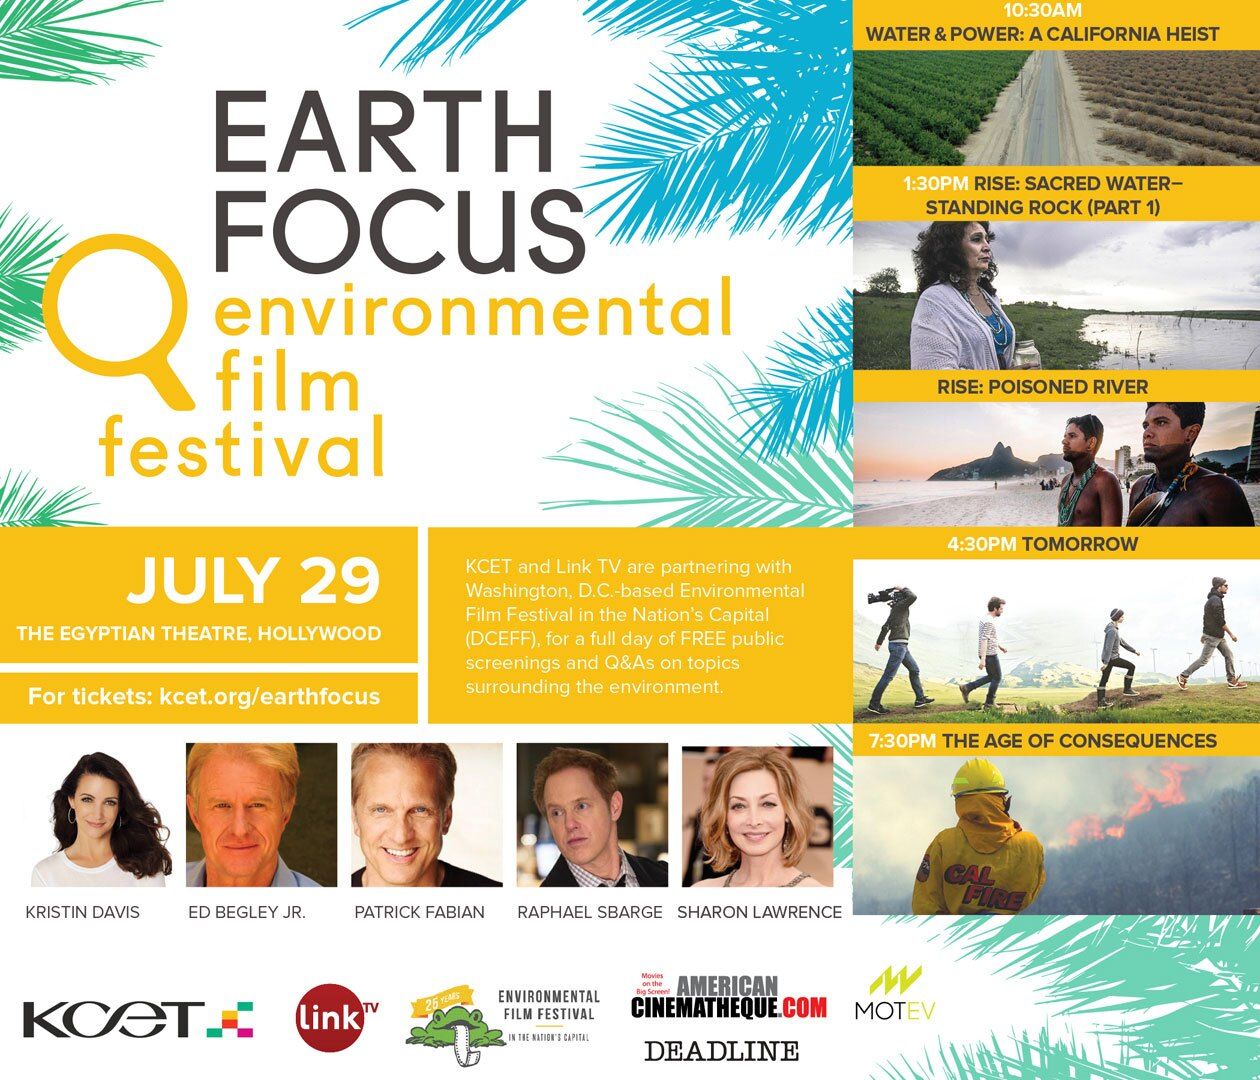 Earth Focus Environmental Film Festival Invite